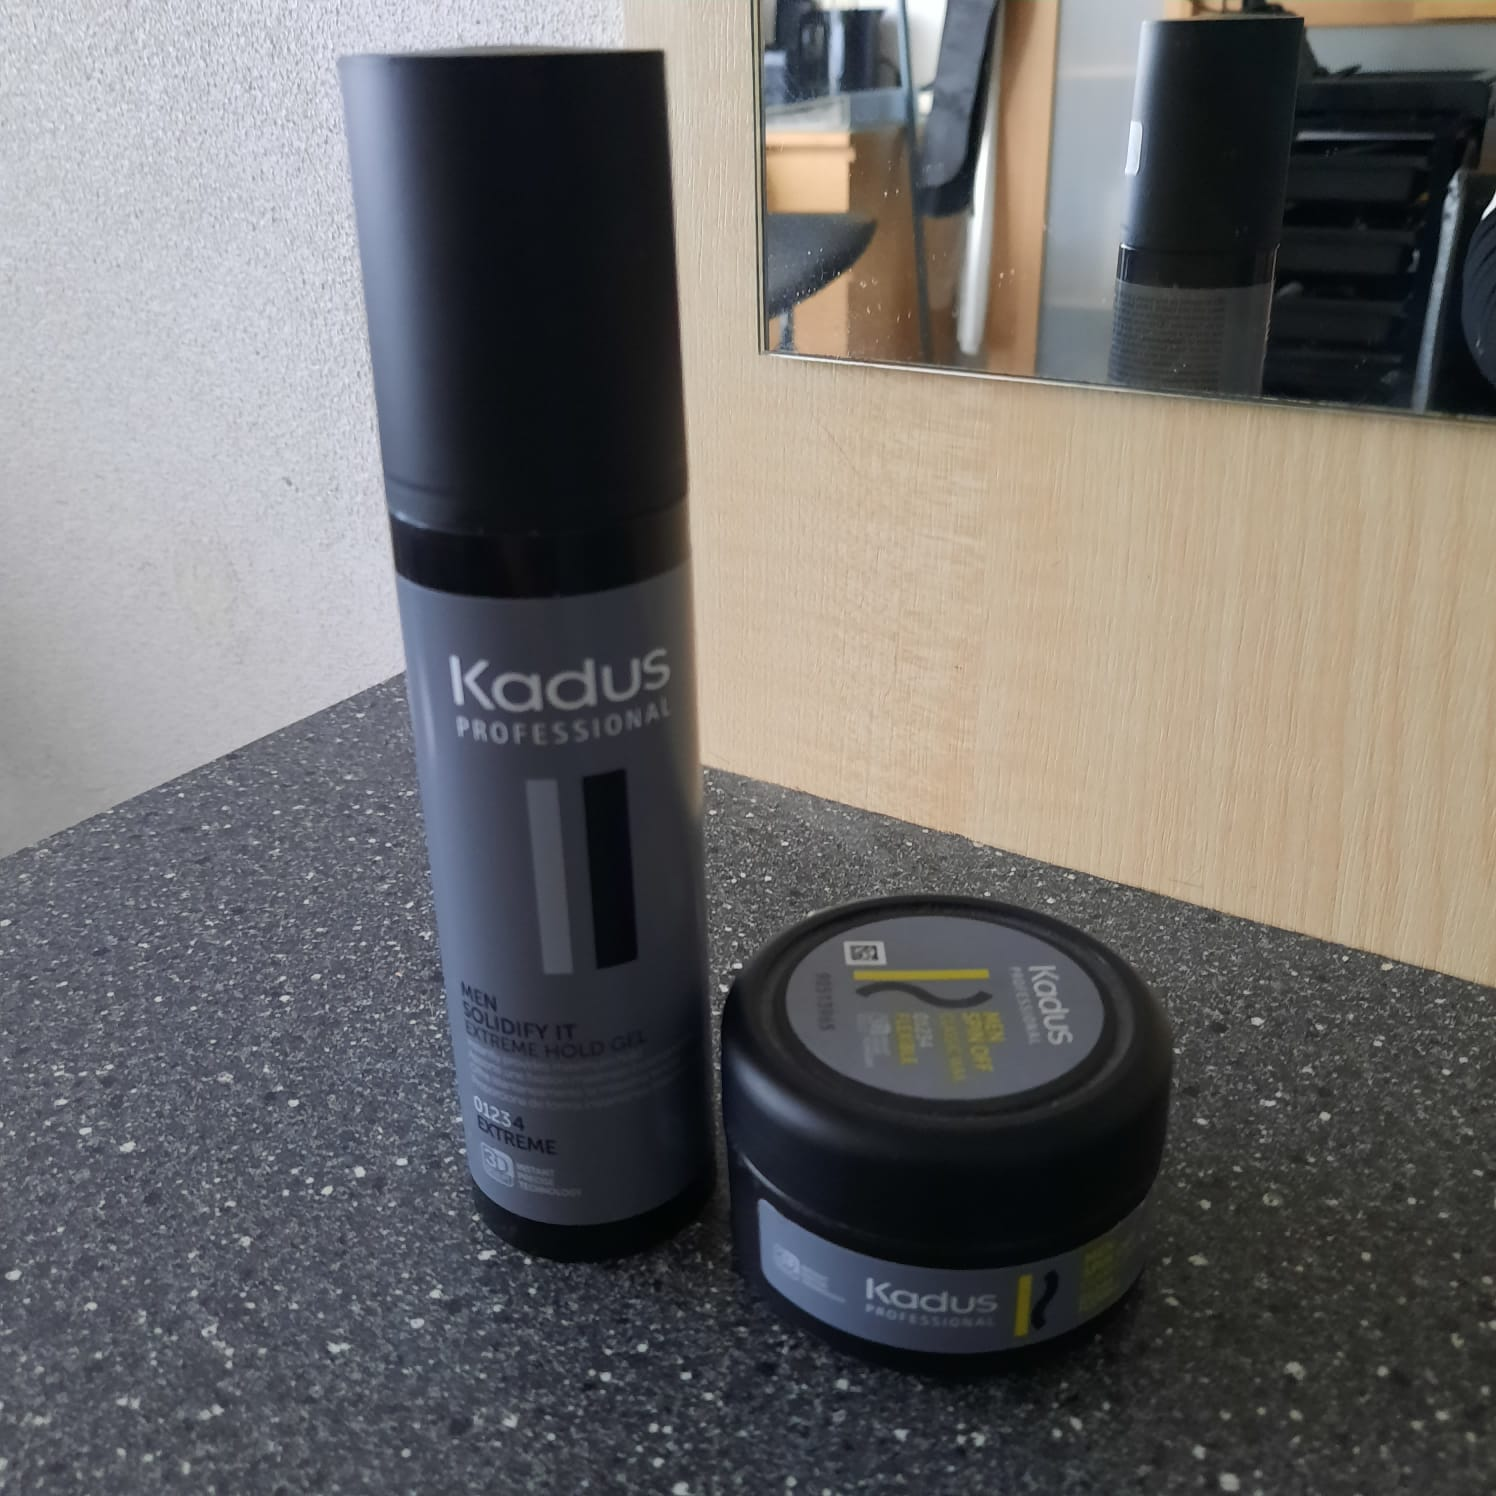 Kadus Product 3